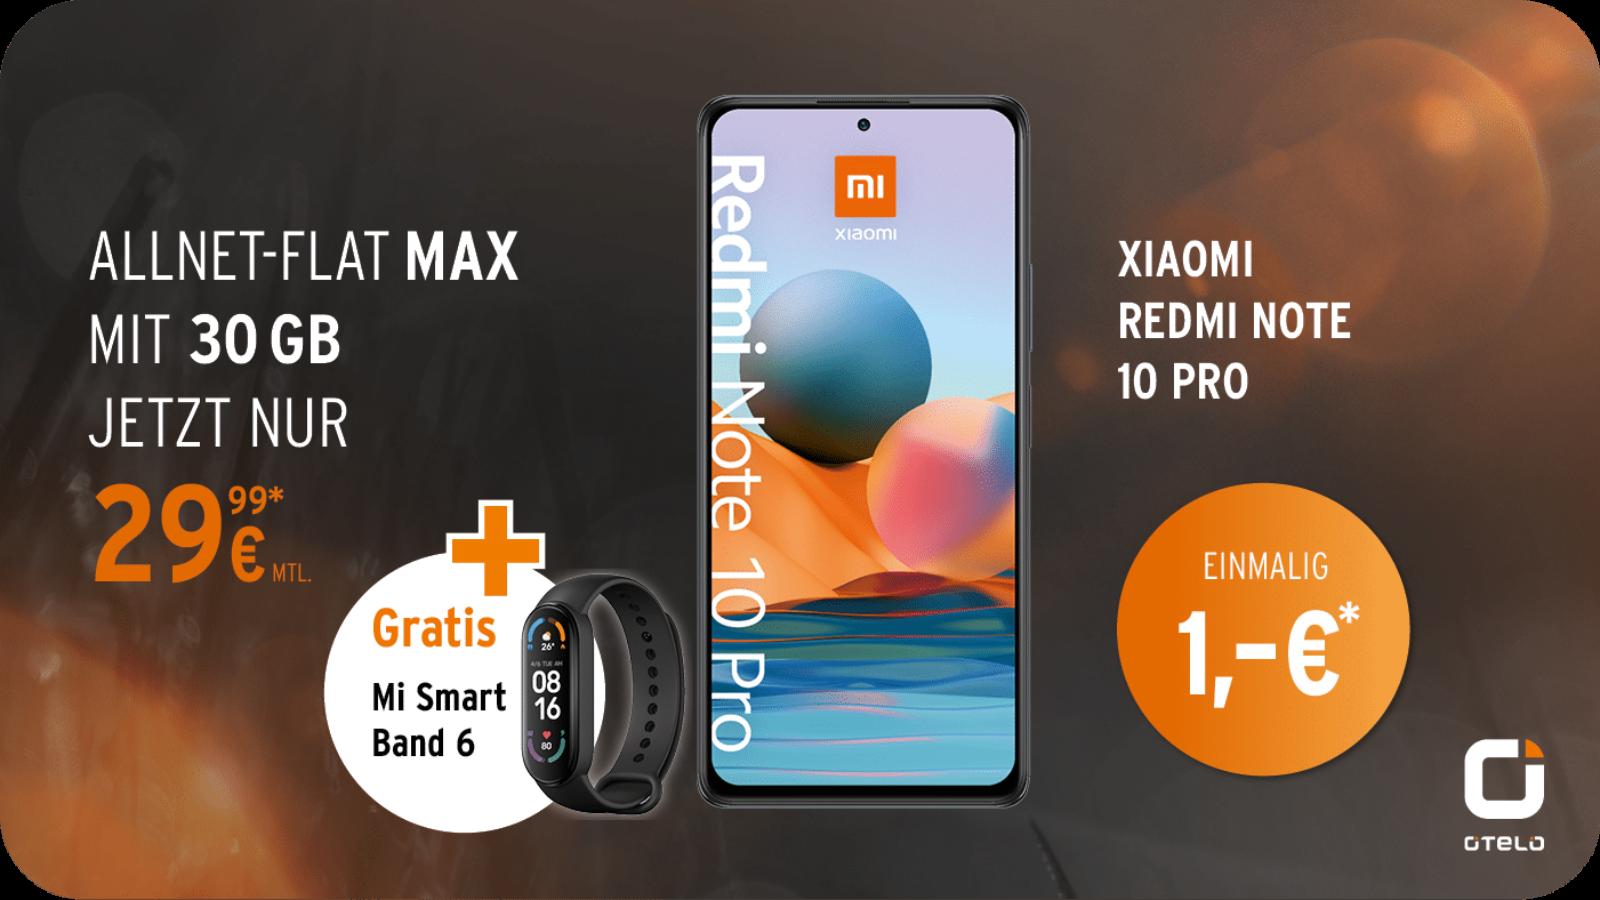 OSH-otelo-Blogpost-Xiaomi-Redmi-note-10pro-ab-10.6